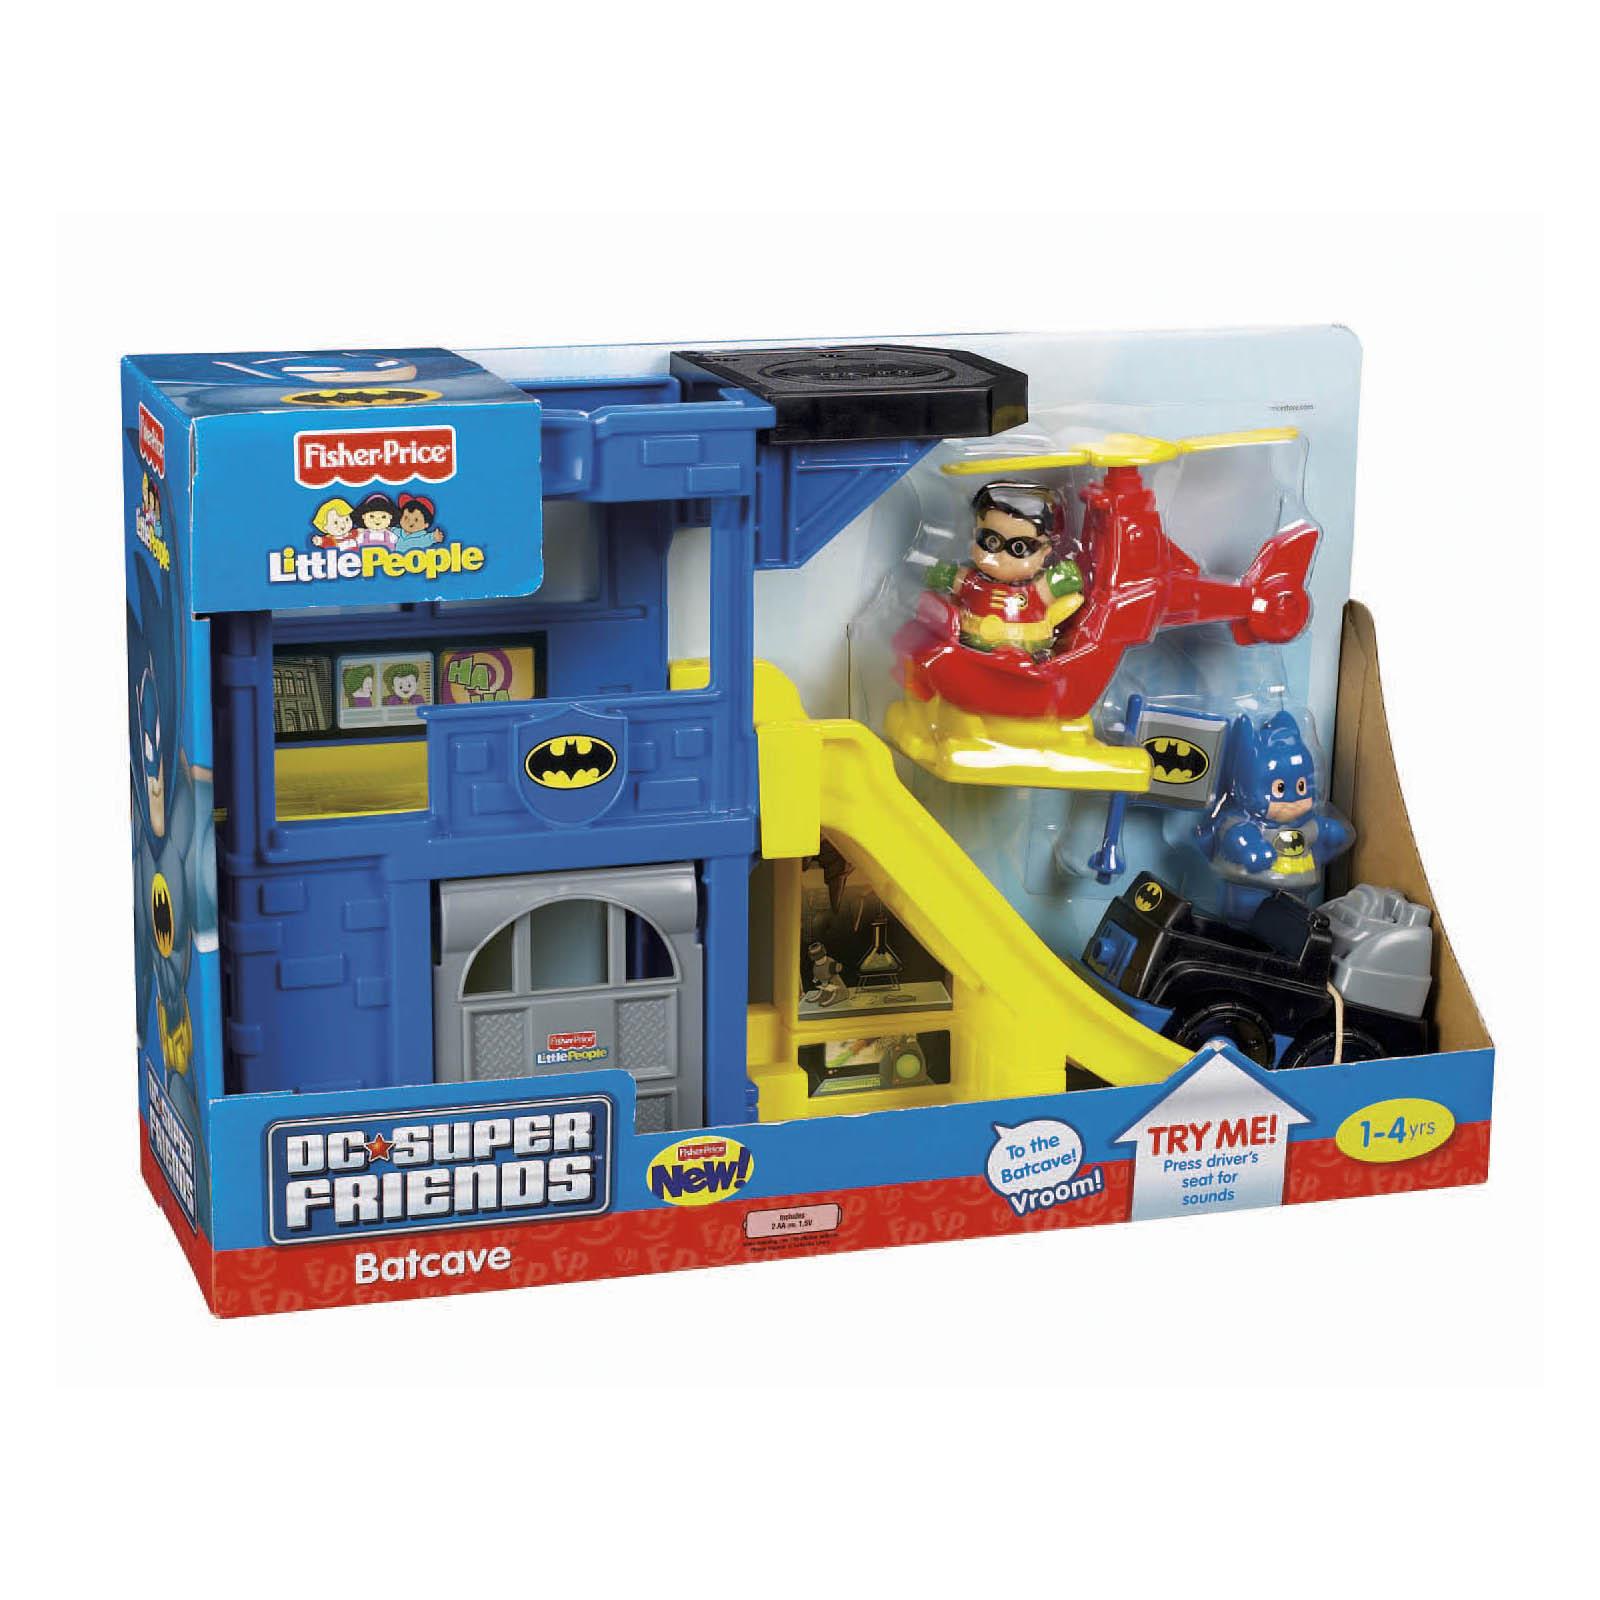 Fisher Price Little People DC Super Friend Batcave.